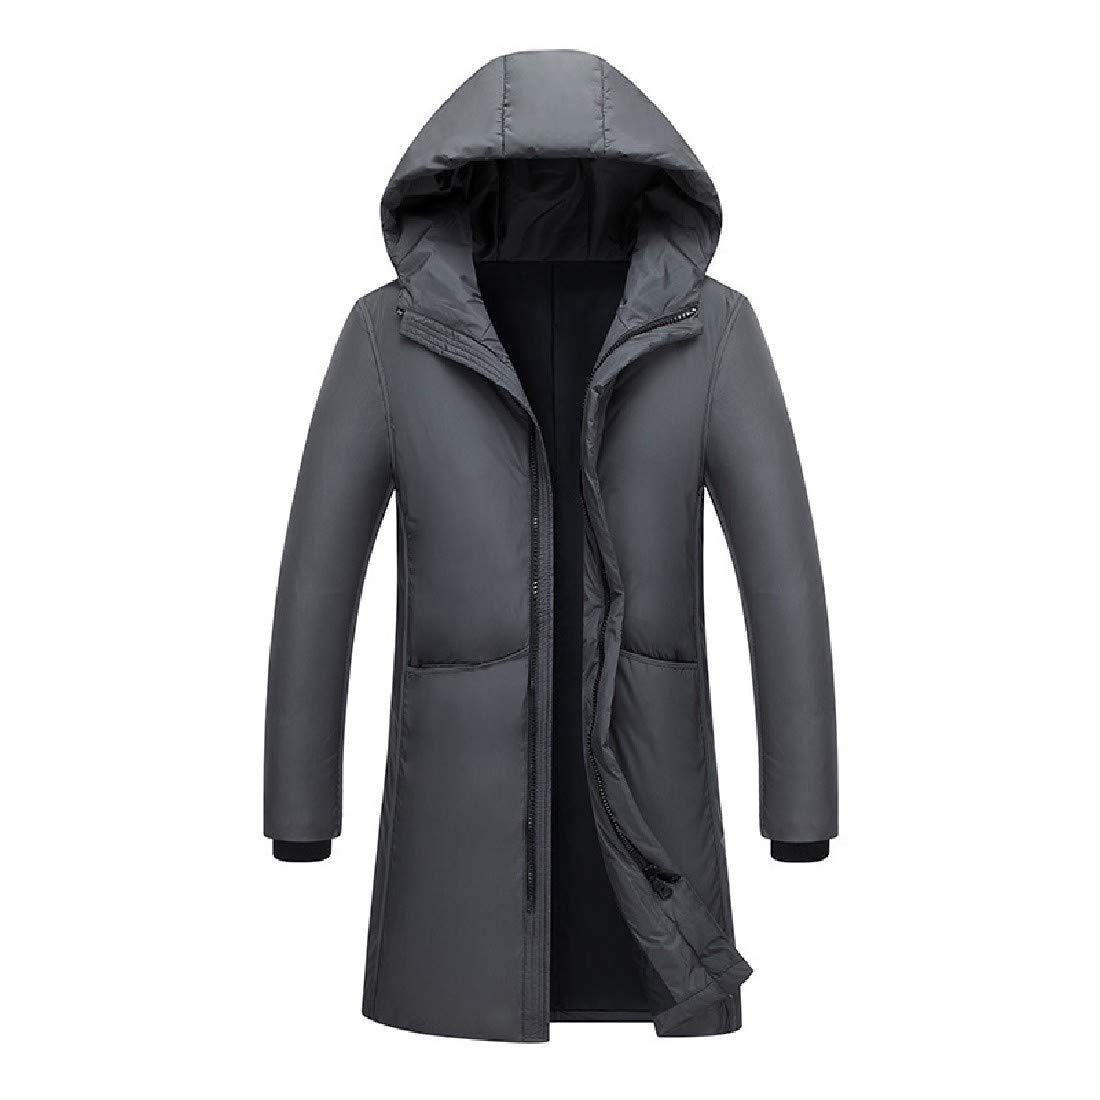 YUNY Mens Skinny Warm Winter Mid Long Down Puffer Jacket Grey 2XL